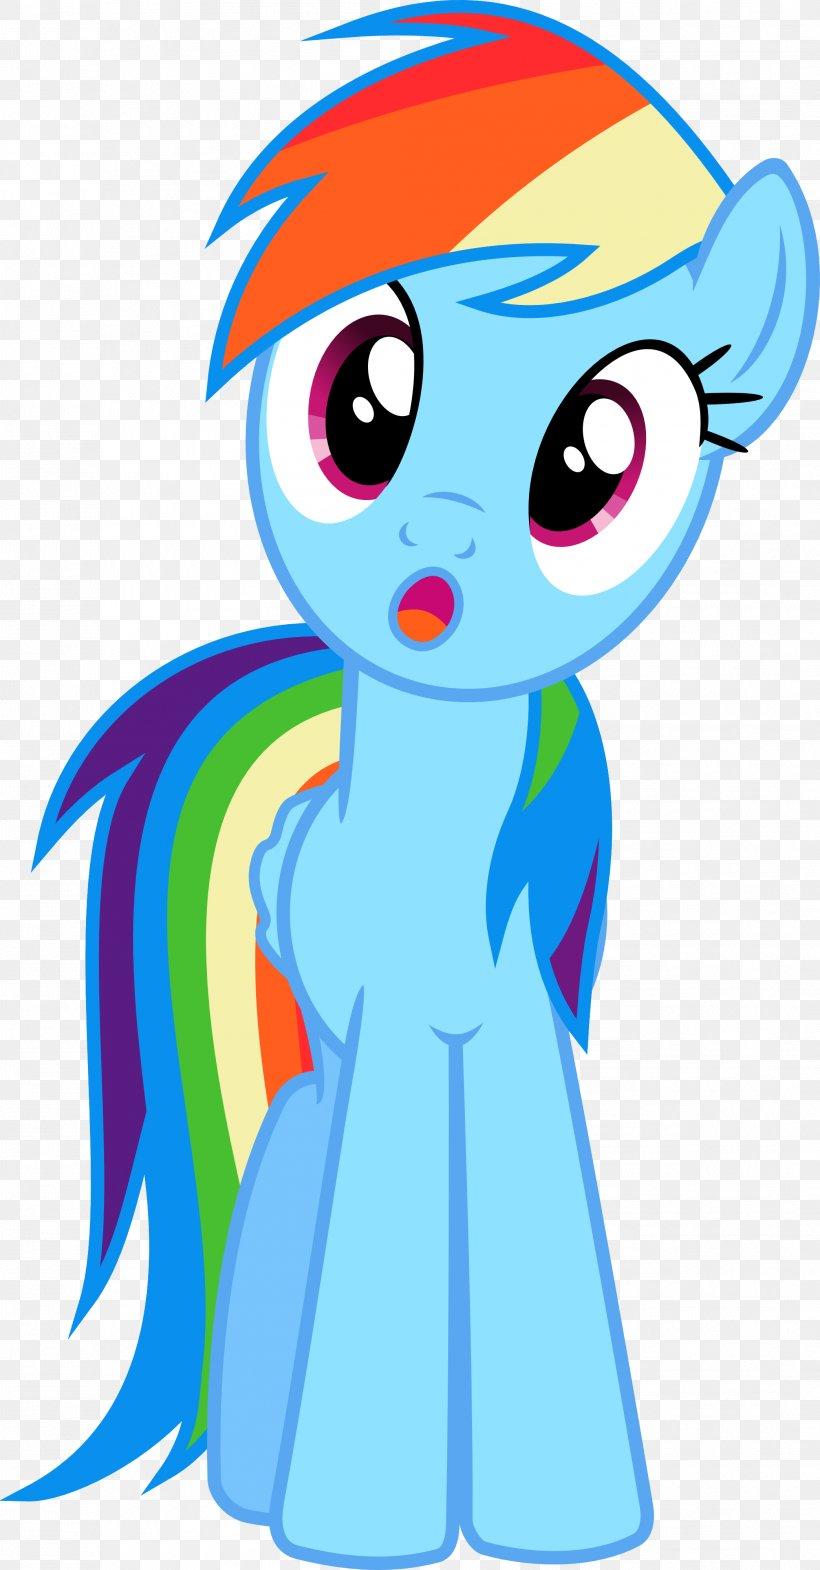 Rainbow Dash Pony Rarity Princess Celestia Pinkie Pie, PNG, 2088x4000px, Watercolor, Cartoon, Flower, Frame, Heart Download Free